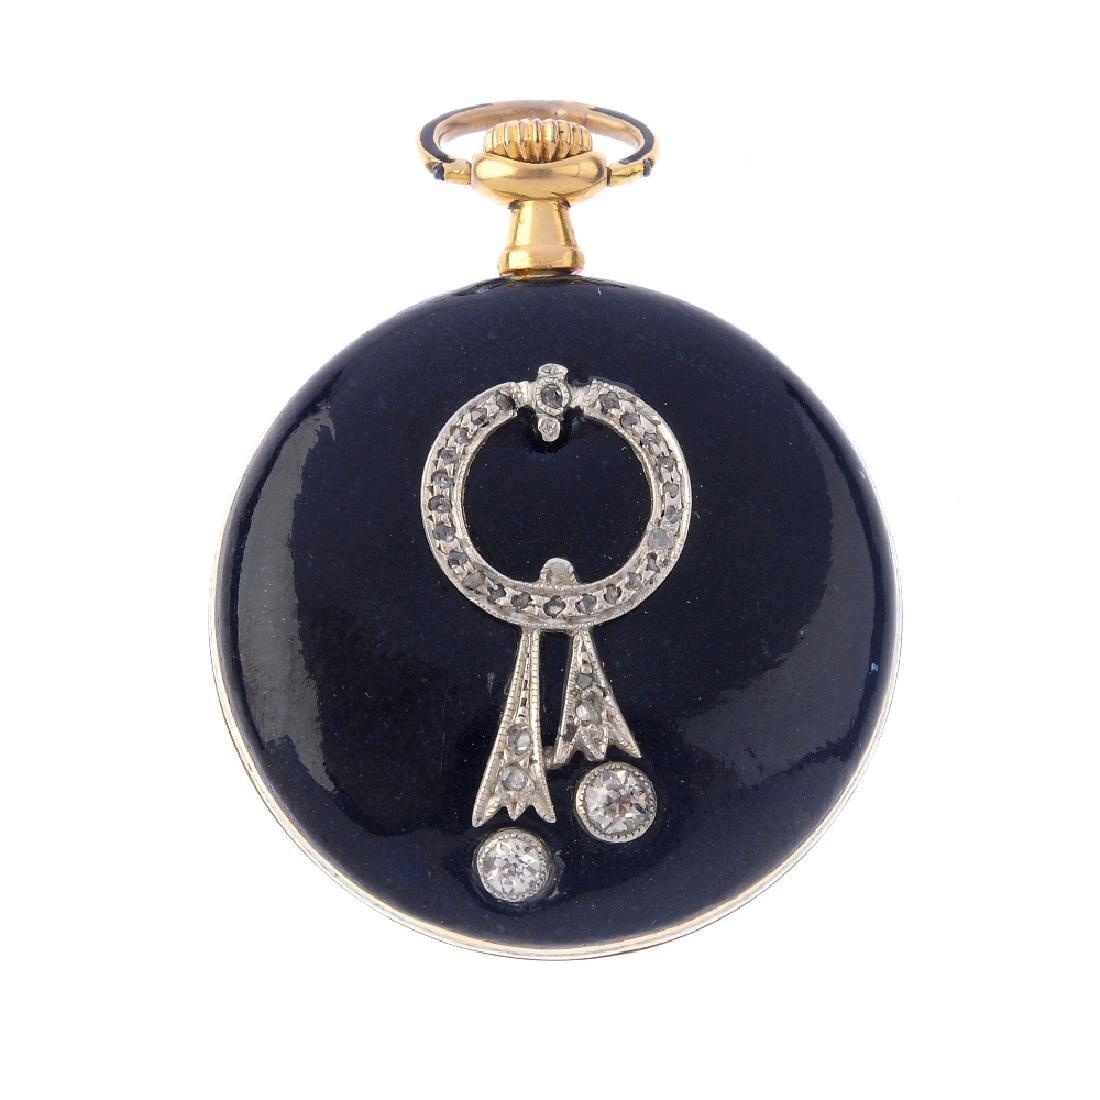 A diamond and black enamel fob watch. The circular dial